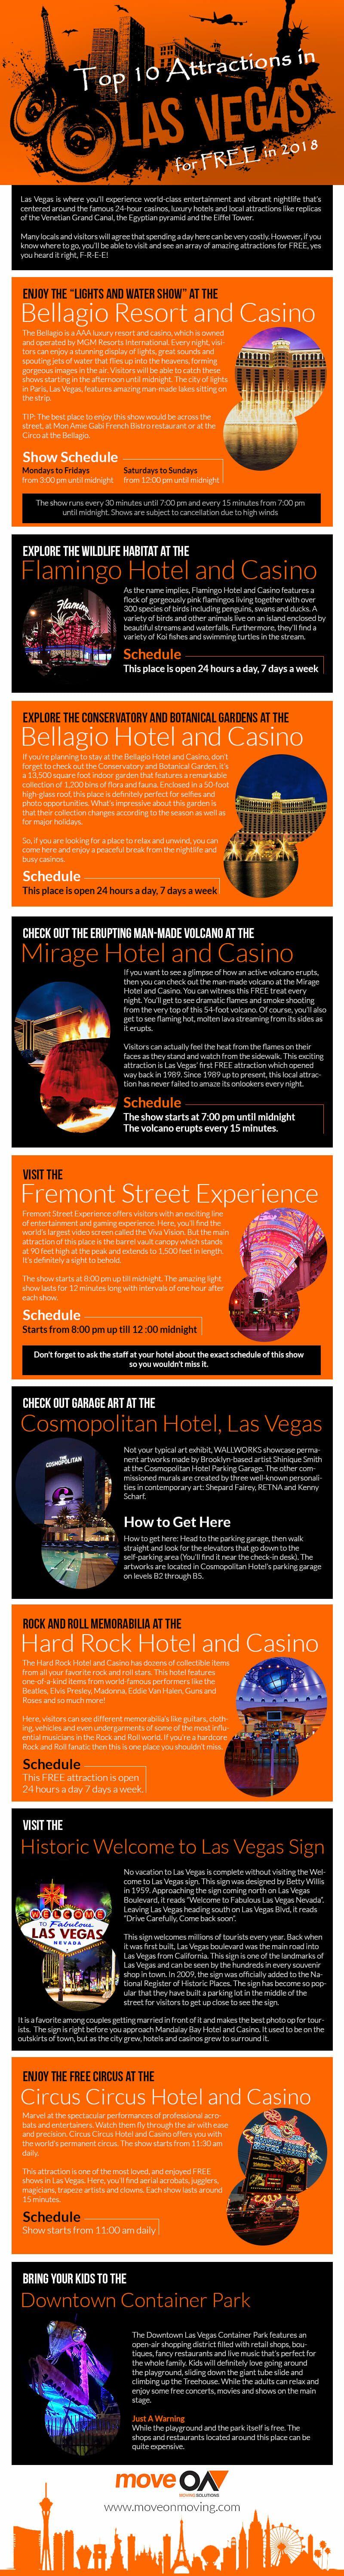 Top 10 Free Things to do in Las Vegas in 2018 (Ultimate